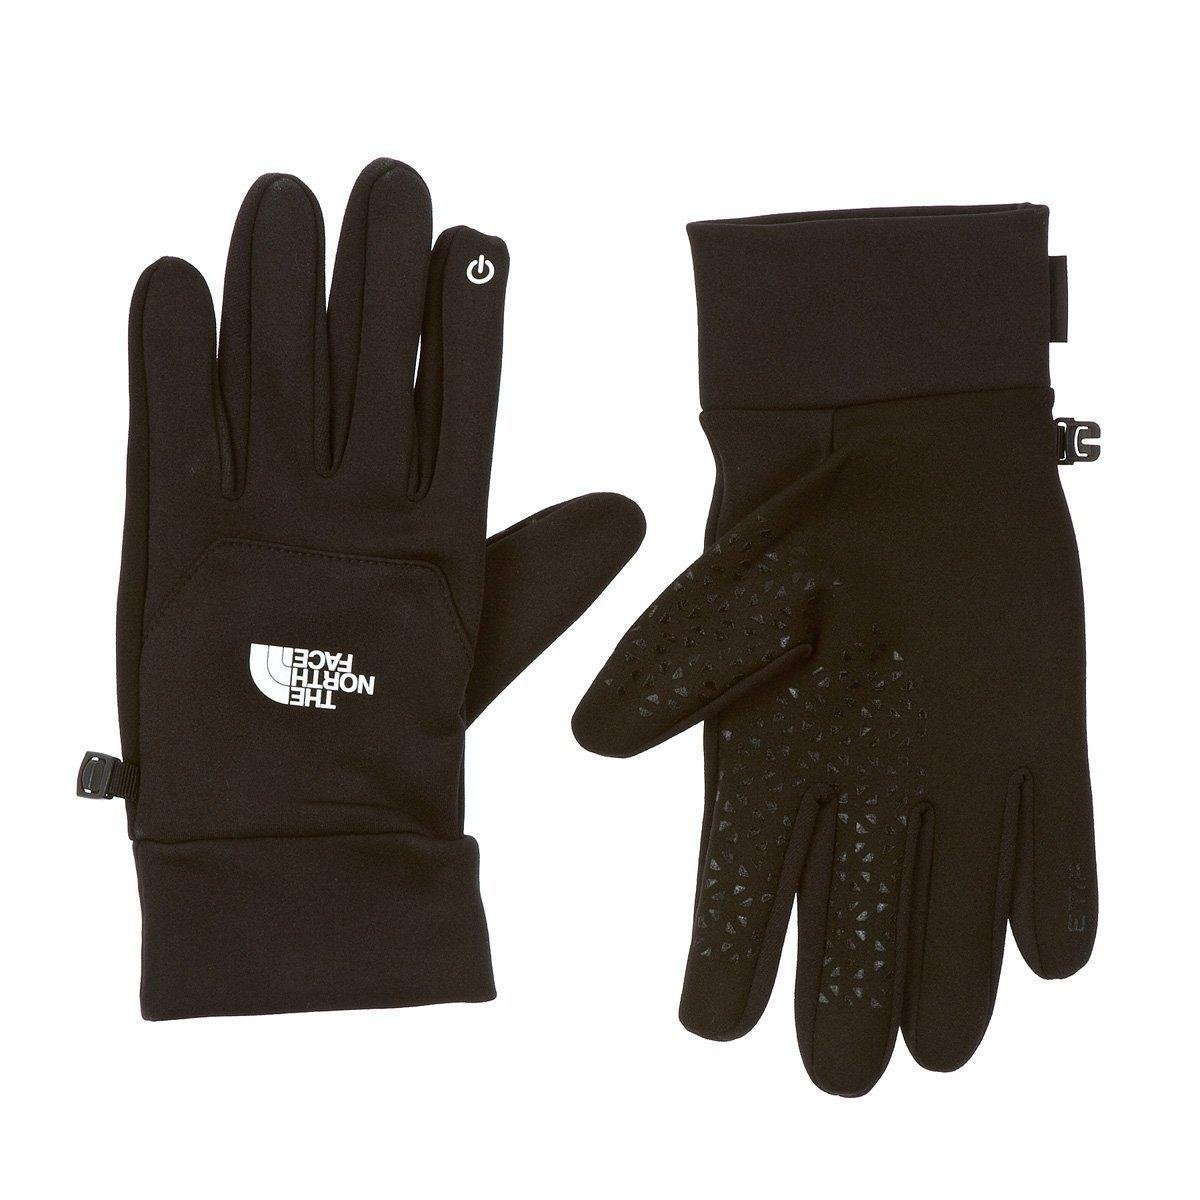 6f6bd9ee1 The North Face Unisex Etip Glove